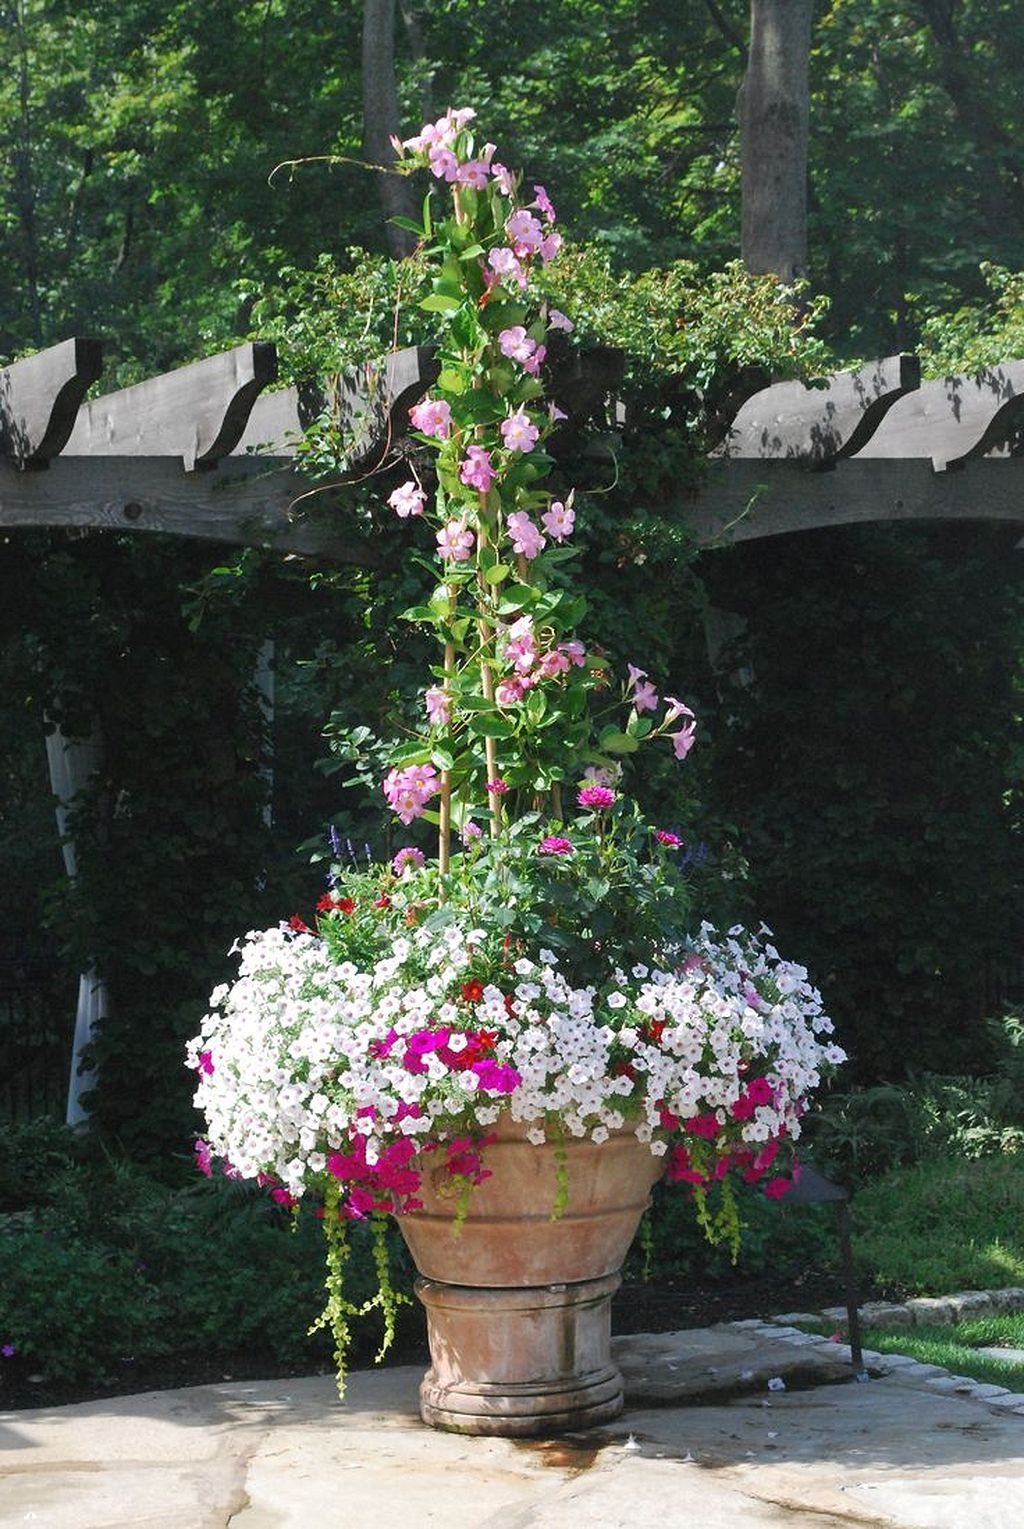 Pin By Zarka On Vasos Container Gardening Flowers Container Garden Design Garden Containers